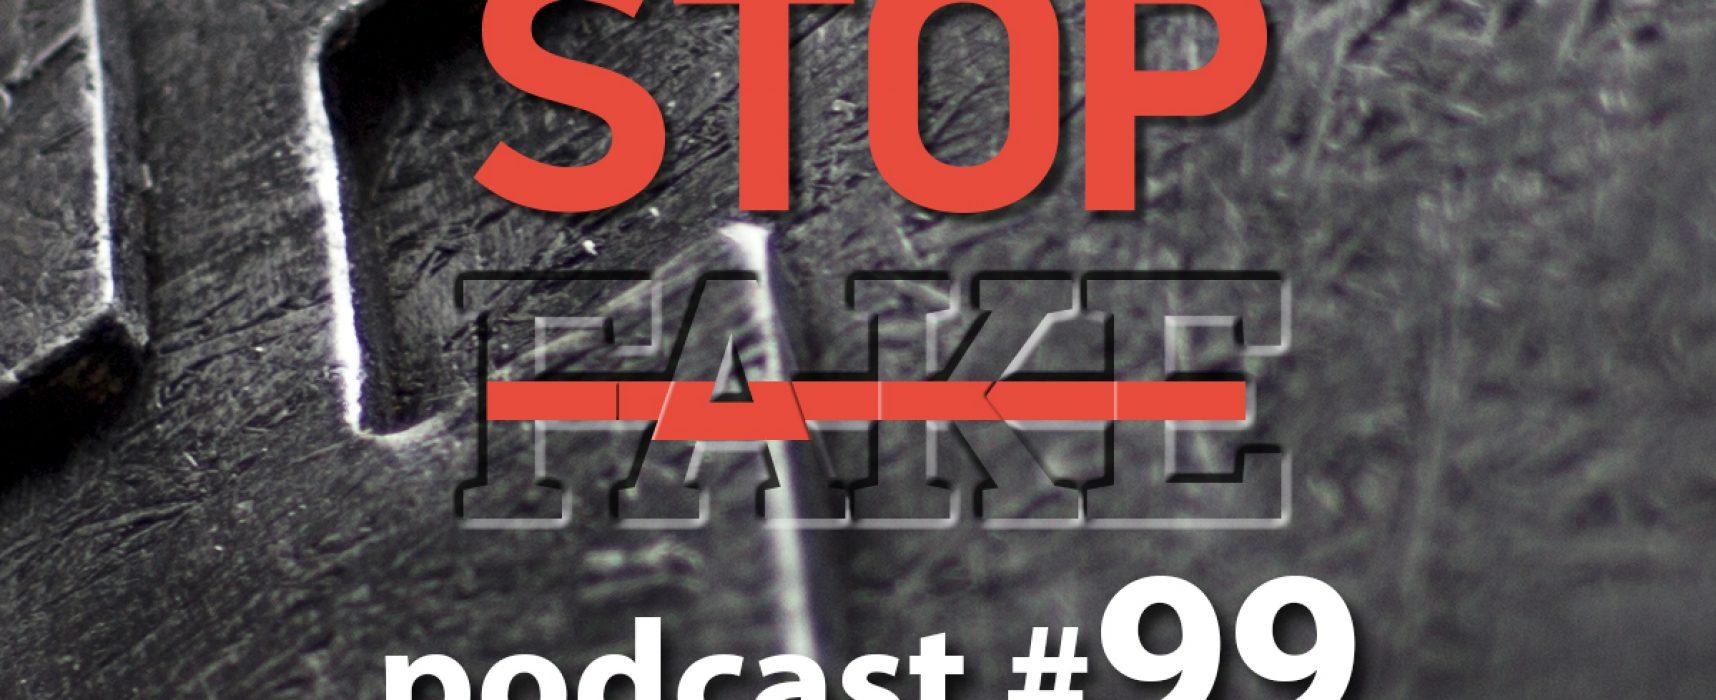 StopFake podcast #99